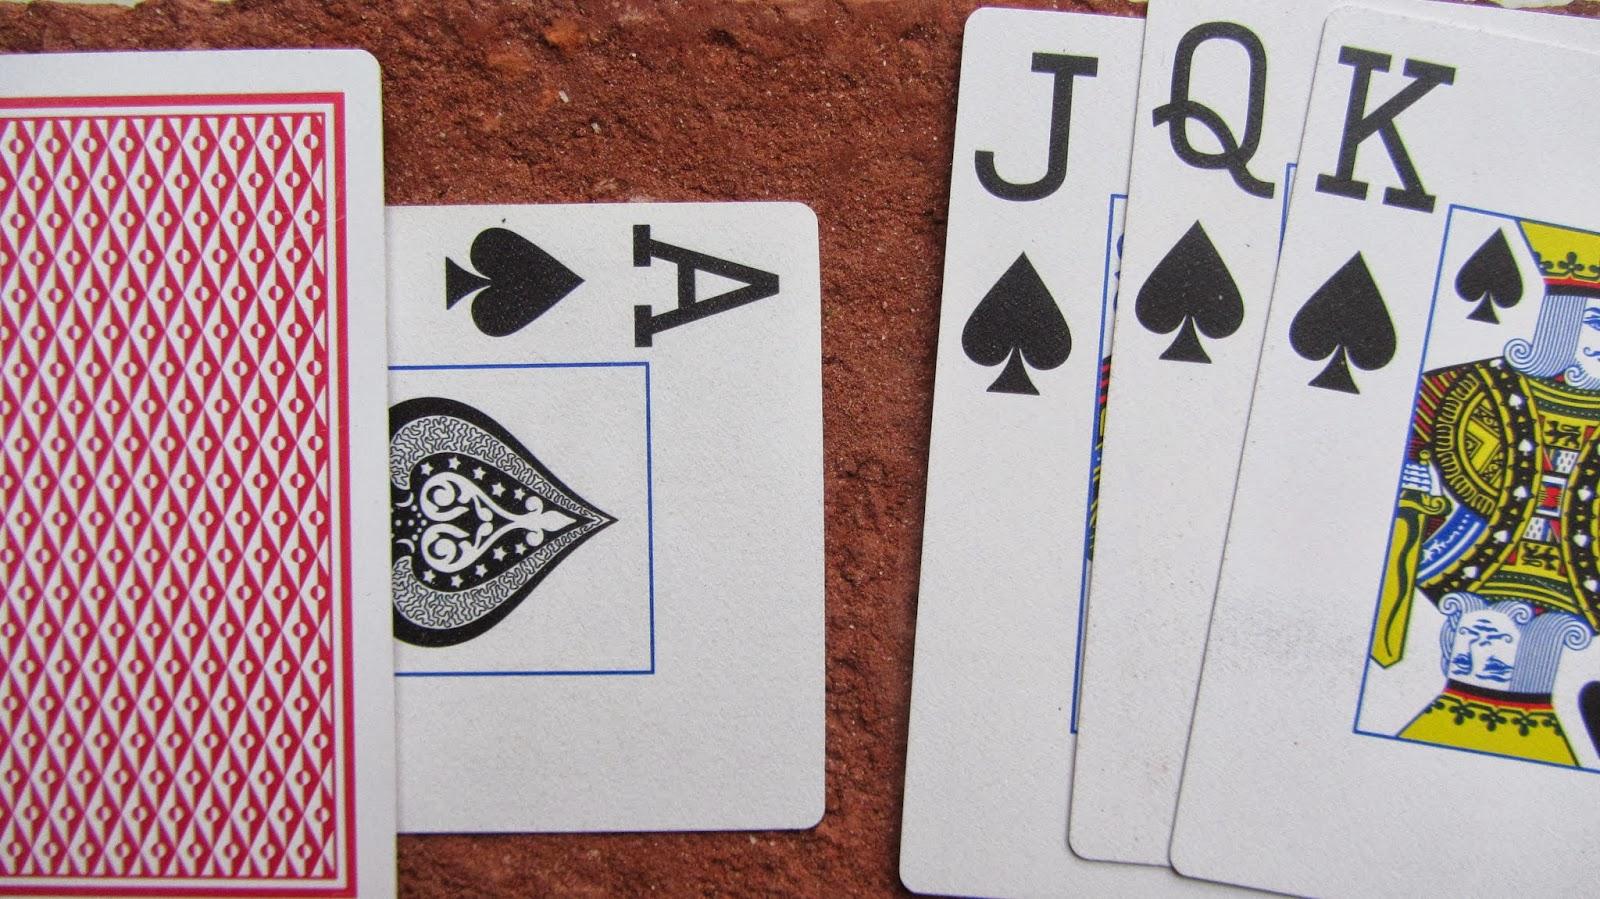 spade card in hindi  Learn Hindi Free: Playing Card Names